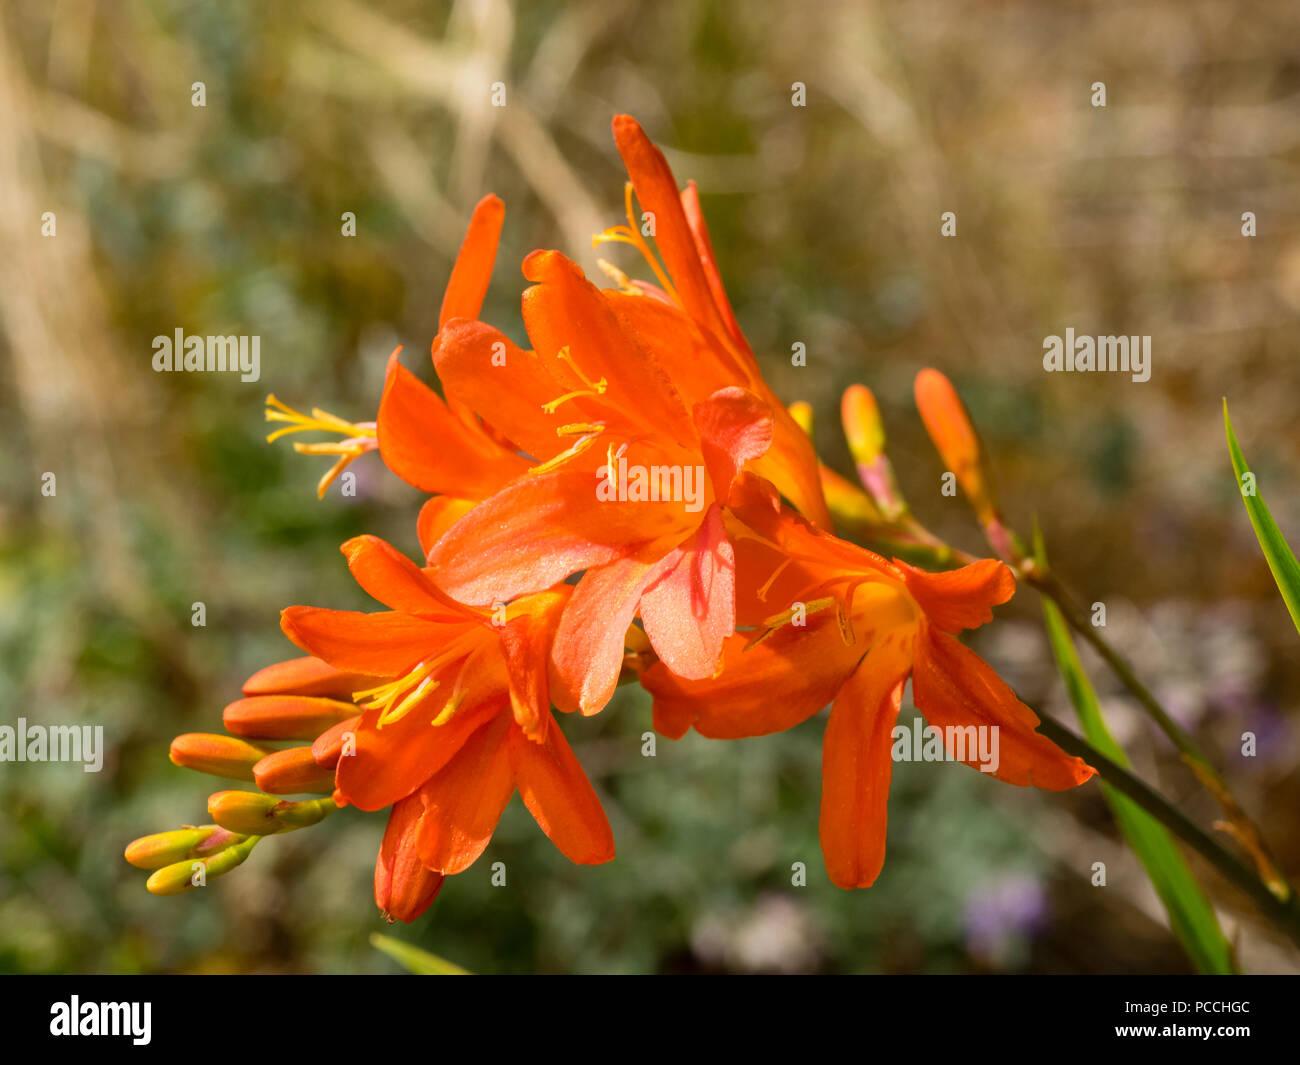 Yellow throated orange shading to salmon flowers of the hardy, later summer flowering perennial, Crocosmia 'Severn Sunrise' - Stock Image